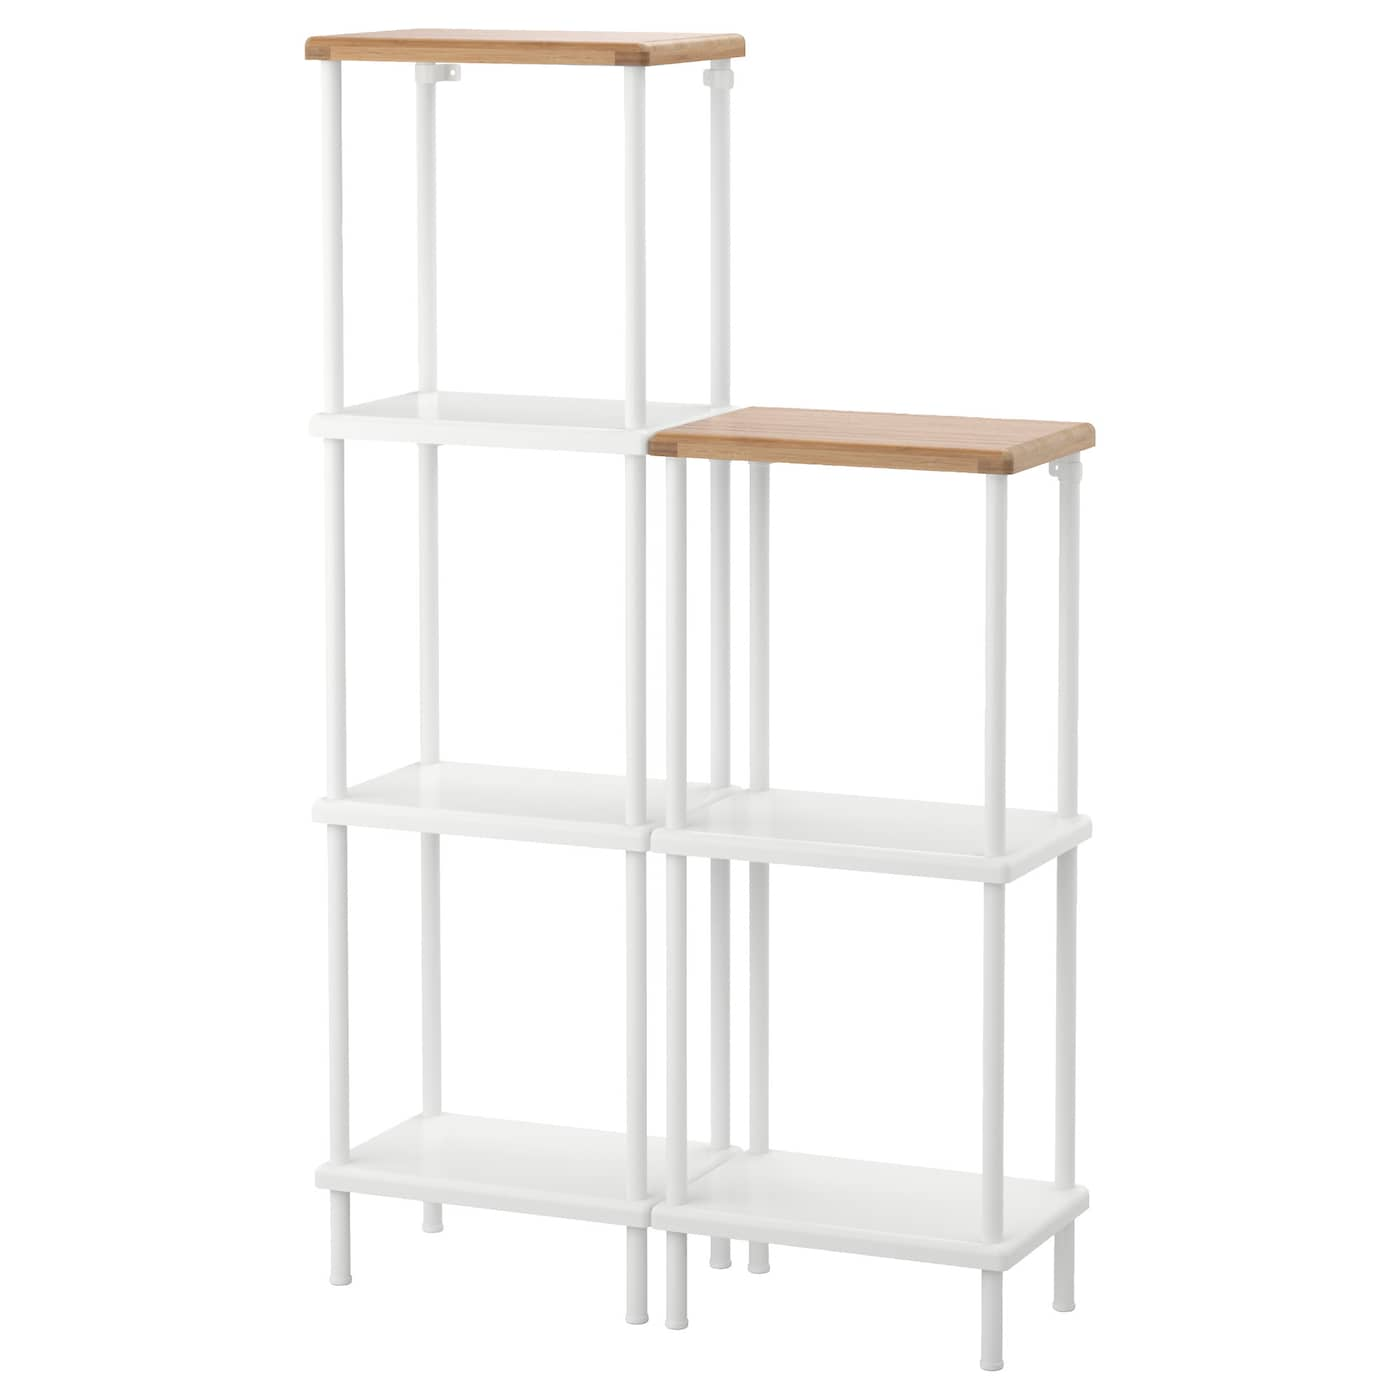 dynan tag re blanc motif bambou 80x27x96 136 cm ikea. Black Bedroom Furniture Sets. Home Design Ideas